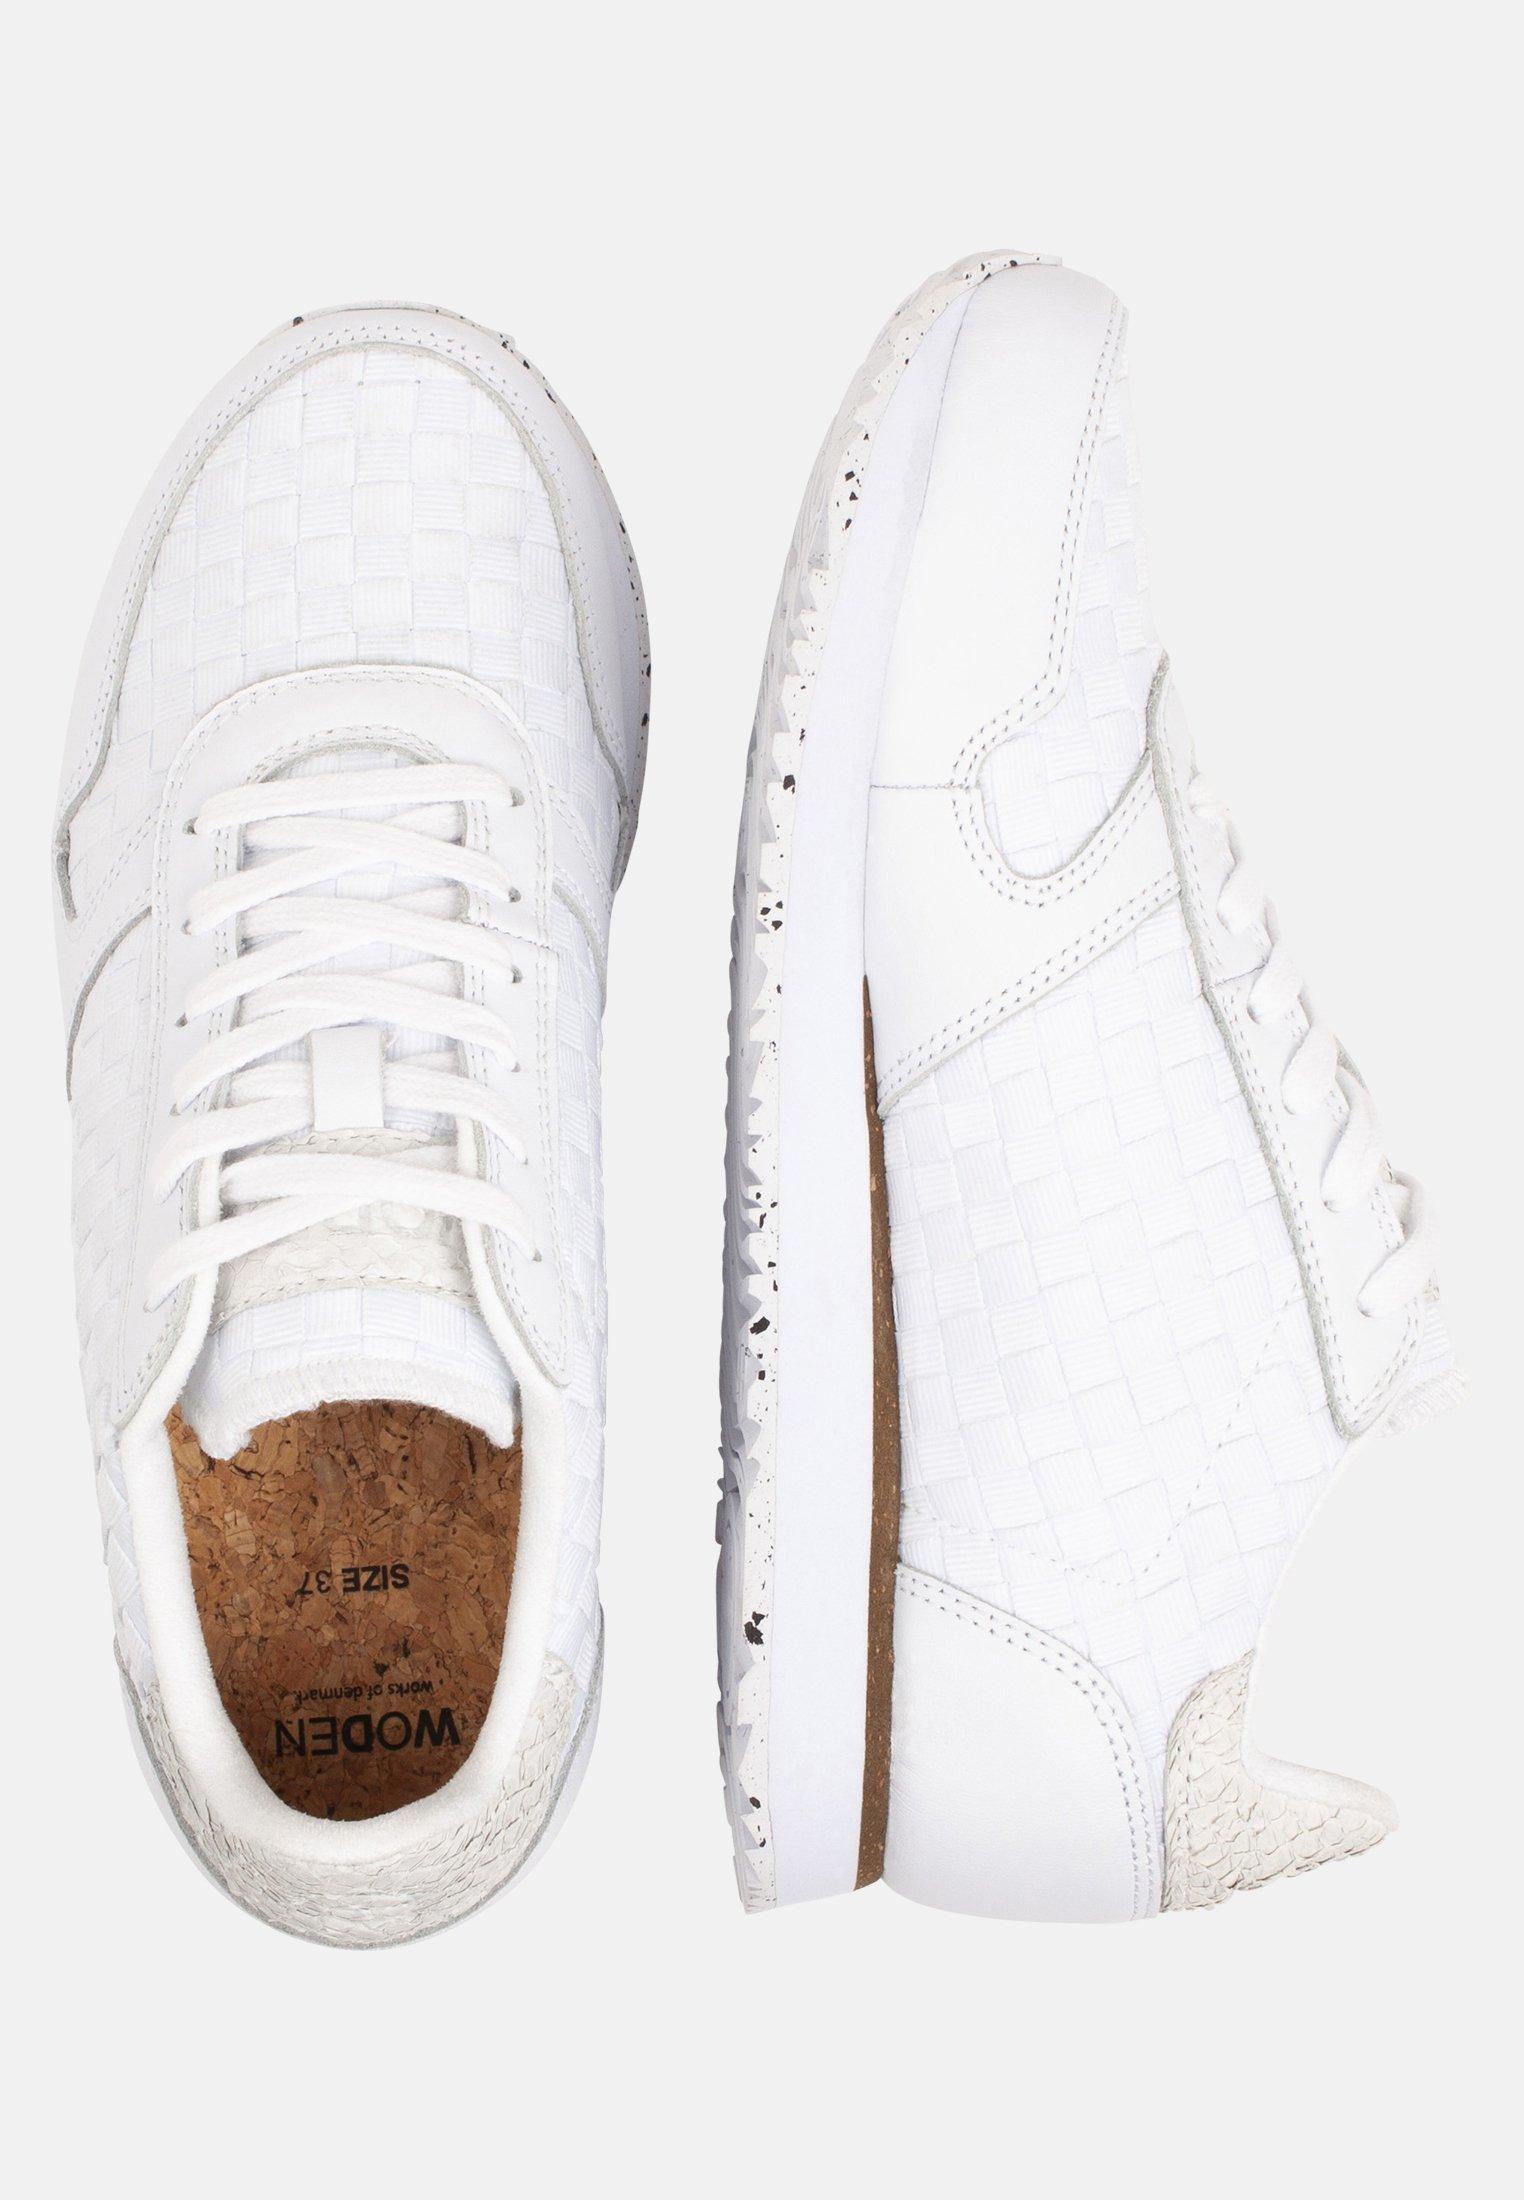 Woden Ydun Nsc - Sneakers Laag White Goedkope Schoenen